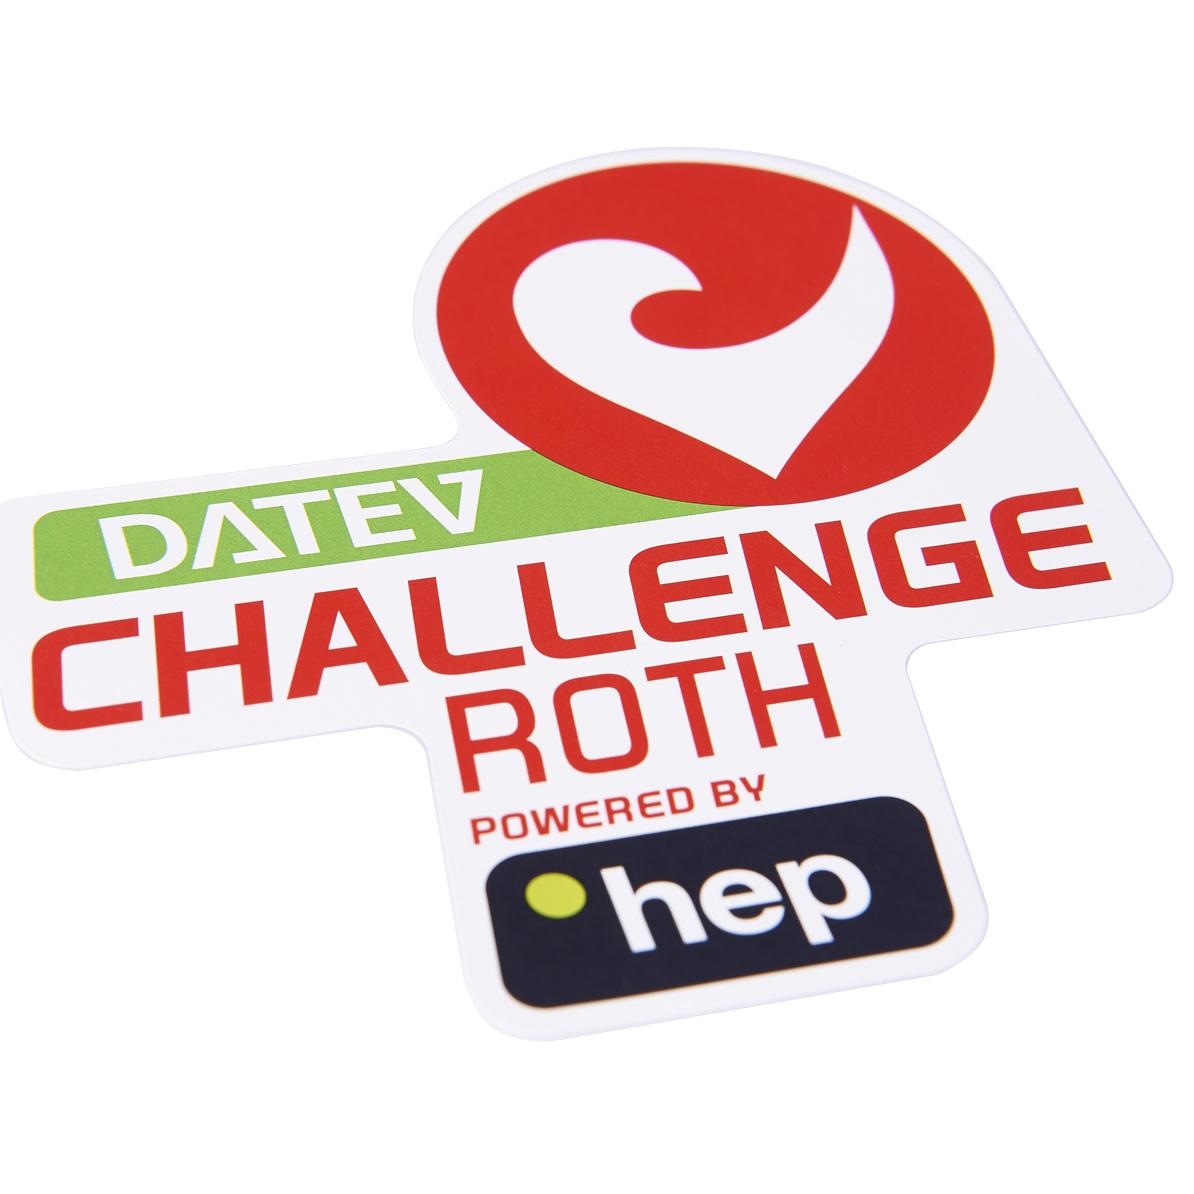 Sticker DATEV Challenge Roth powered by hep big-2